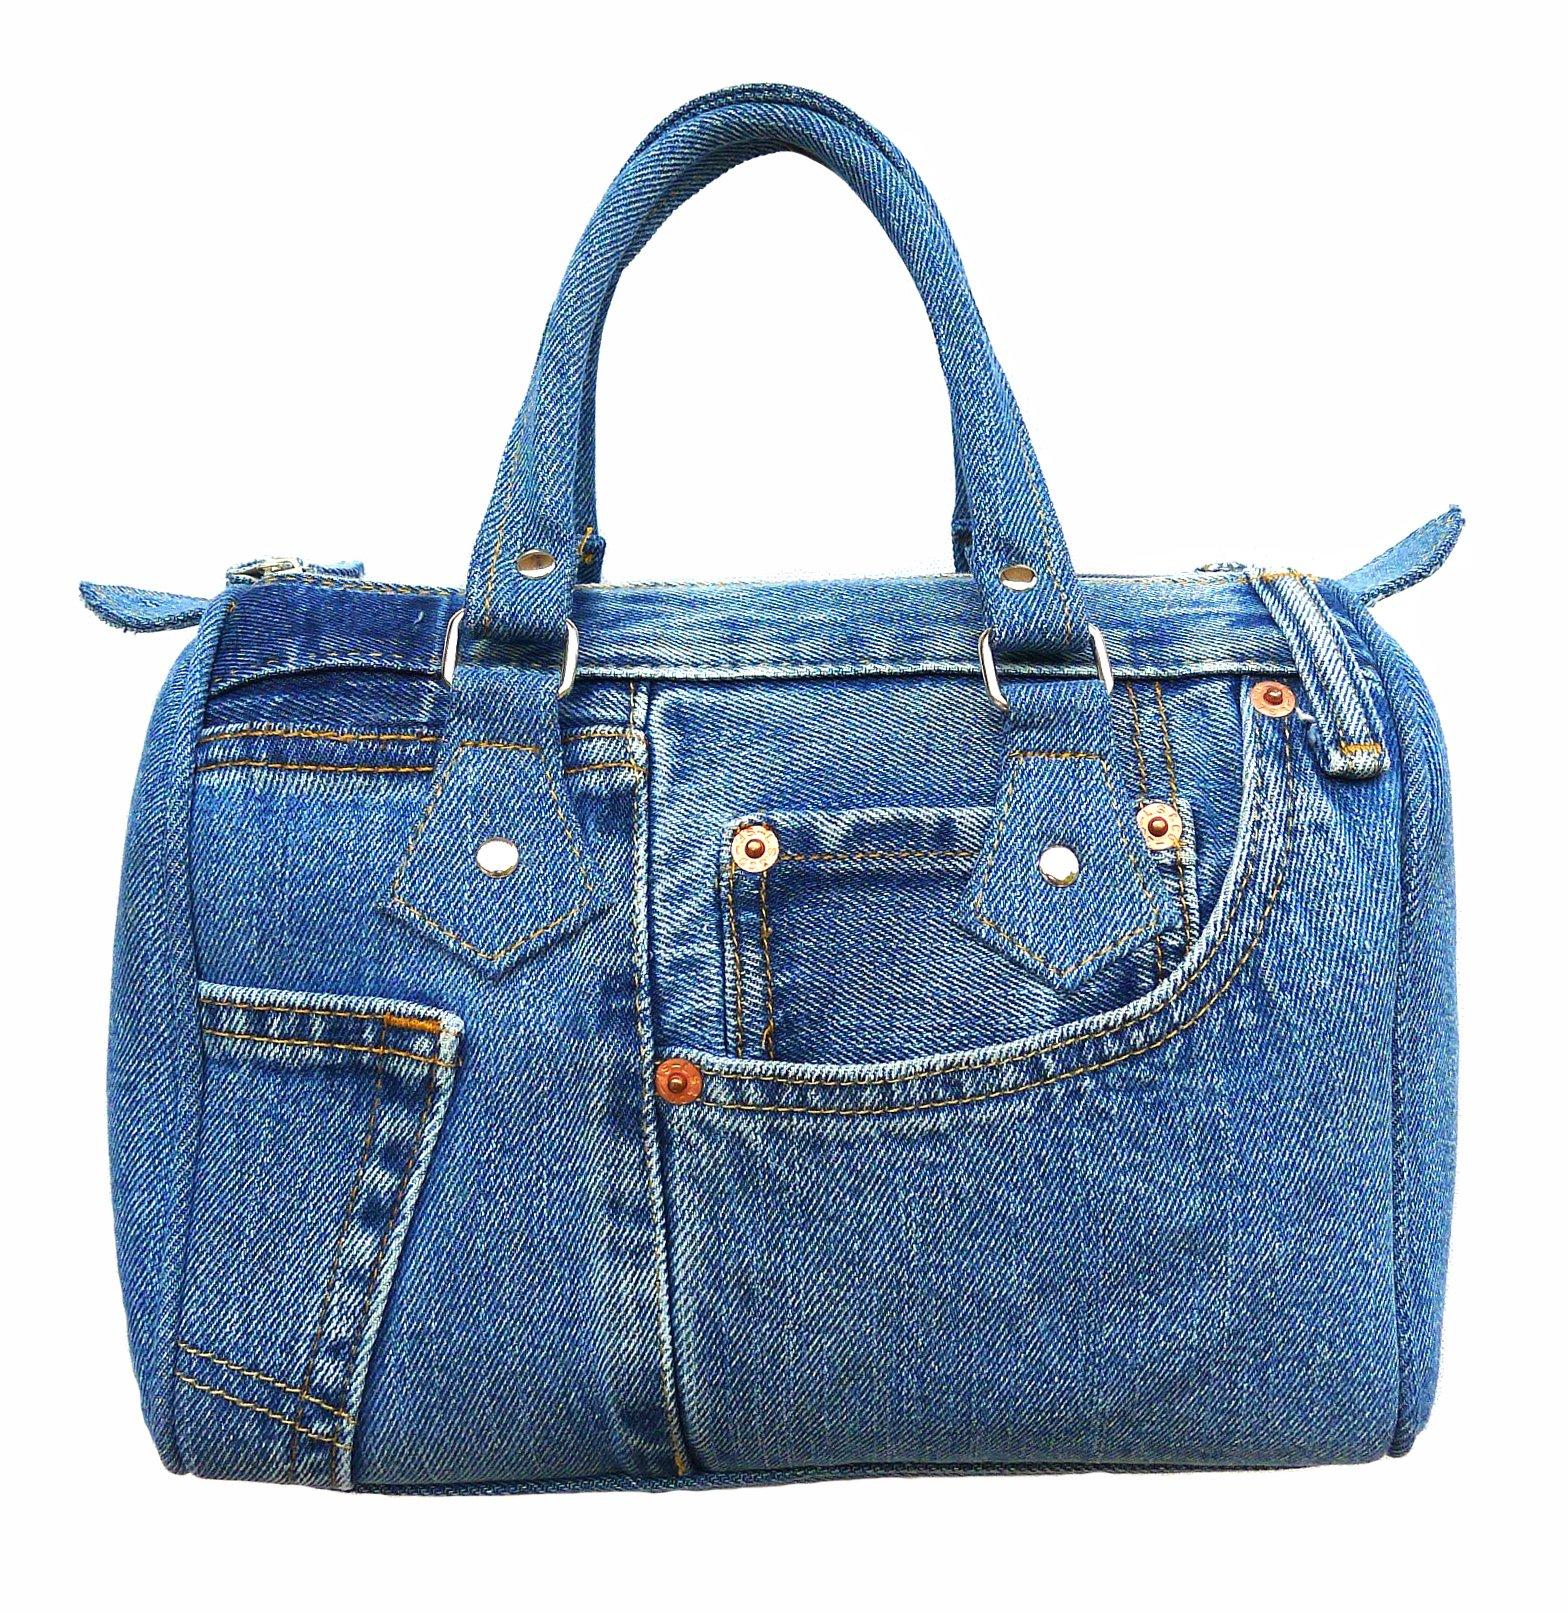 Bijoux De Ja Classic Blue Denim Jean Doctor Style Women Handbag (LL-04)